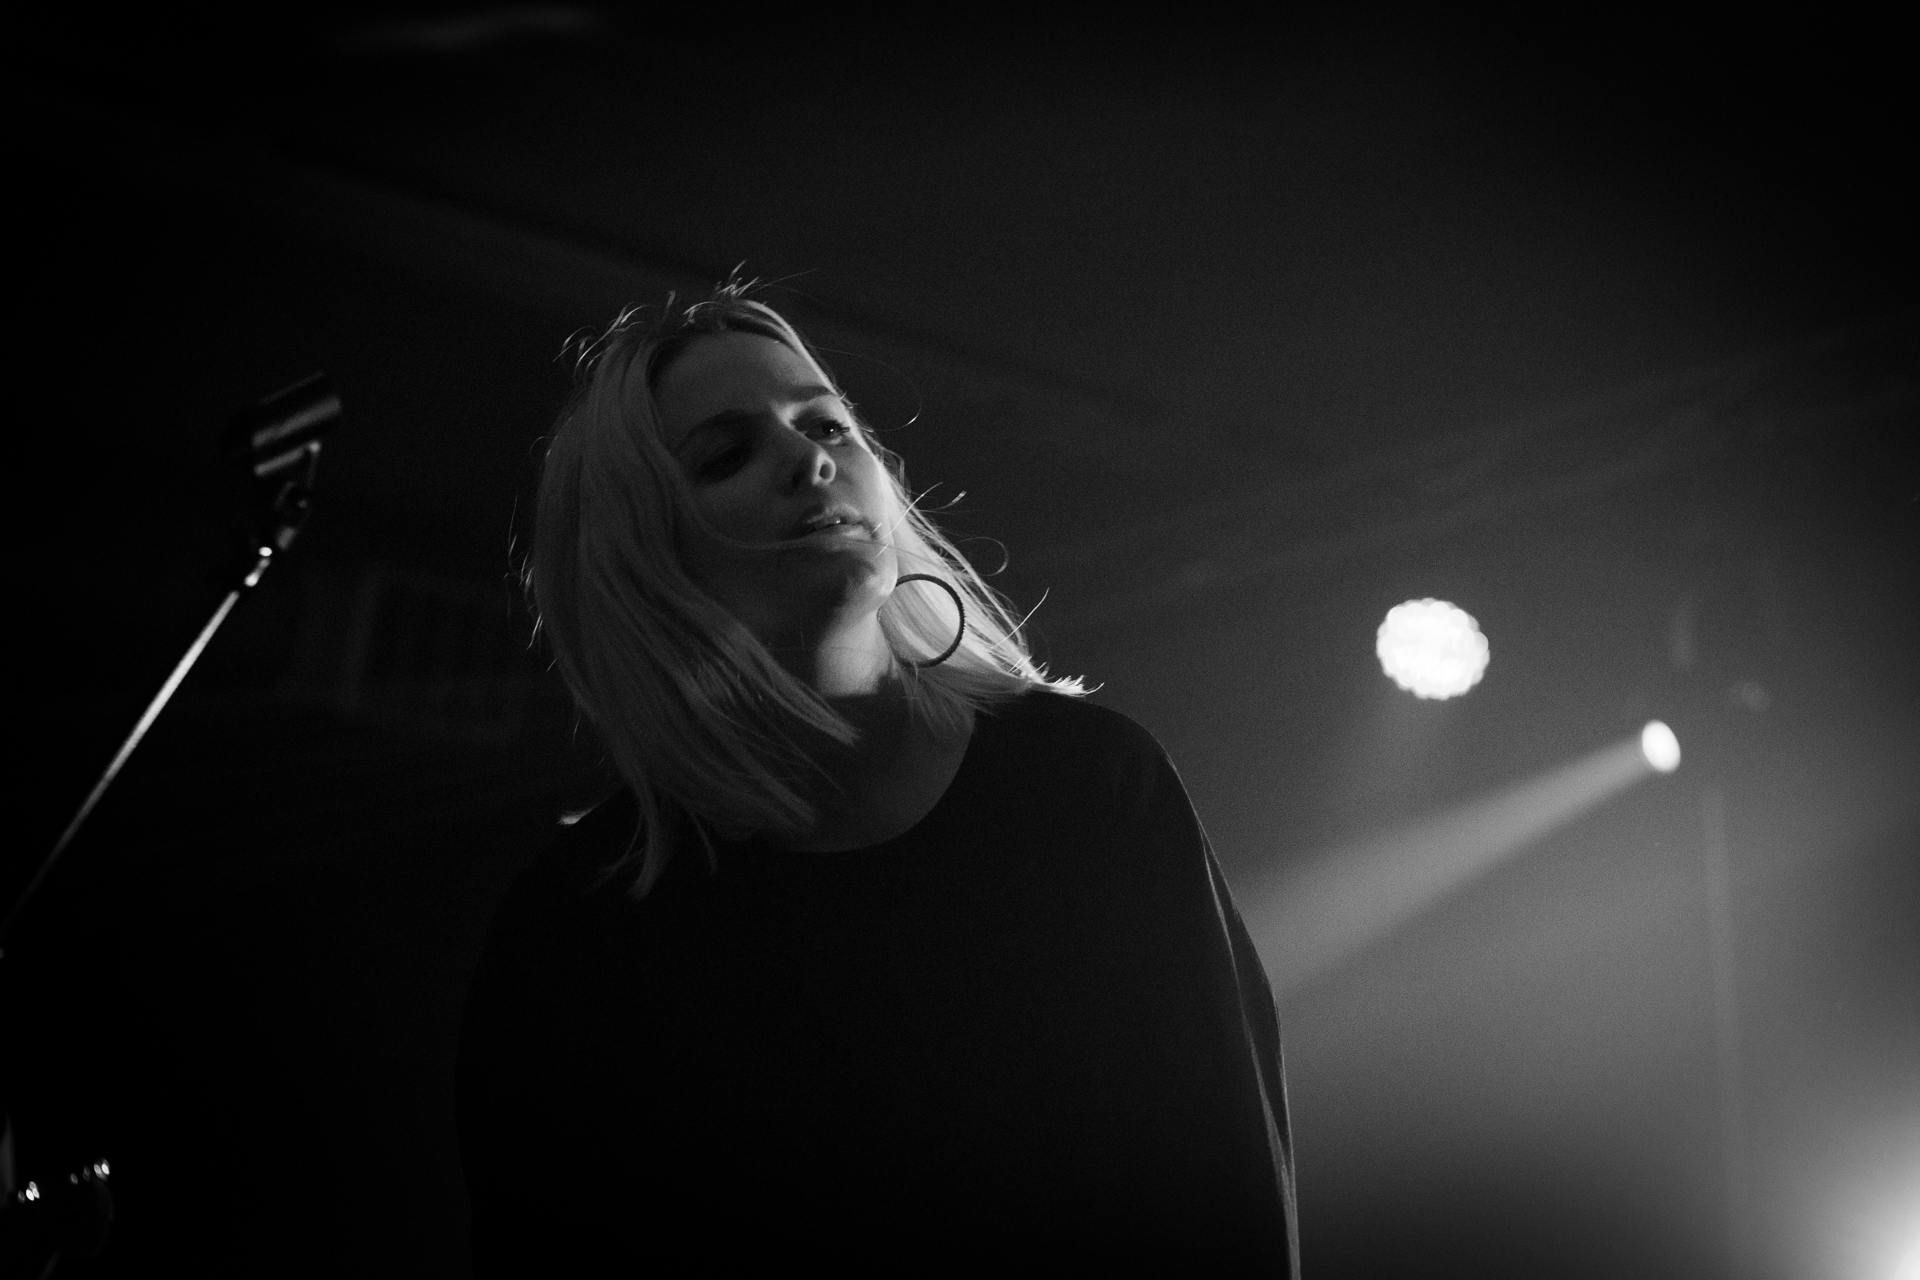 Photo by Marisa Huncherick